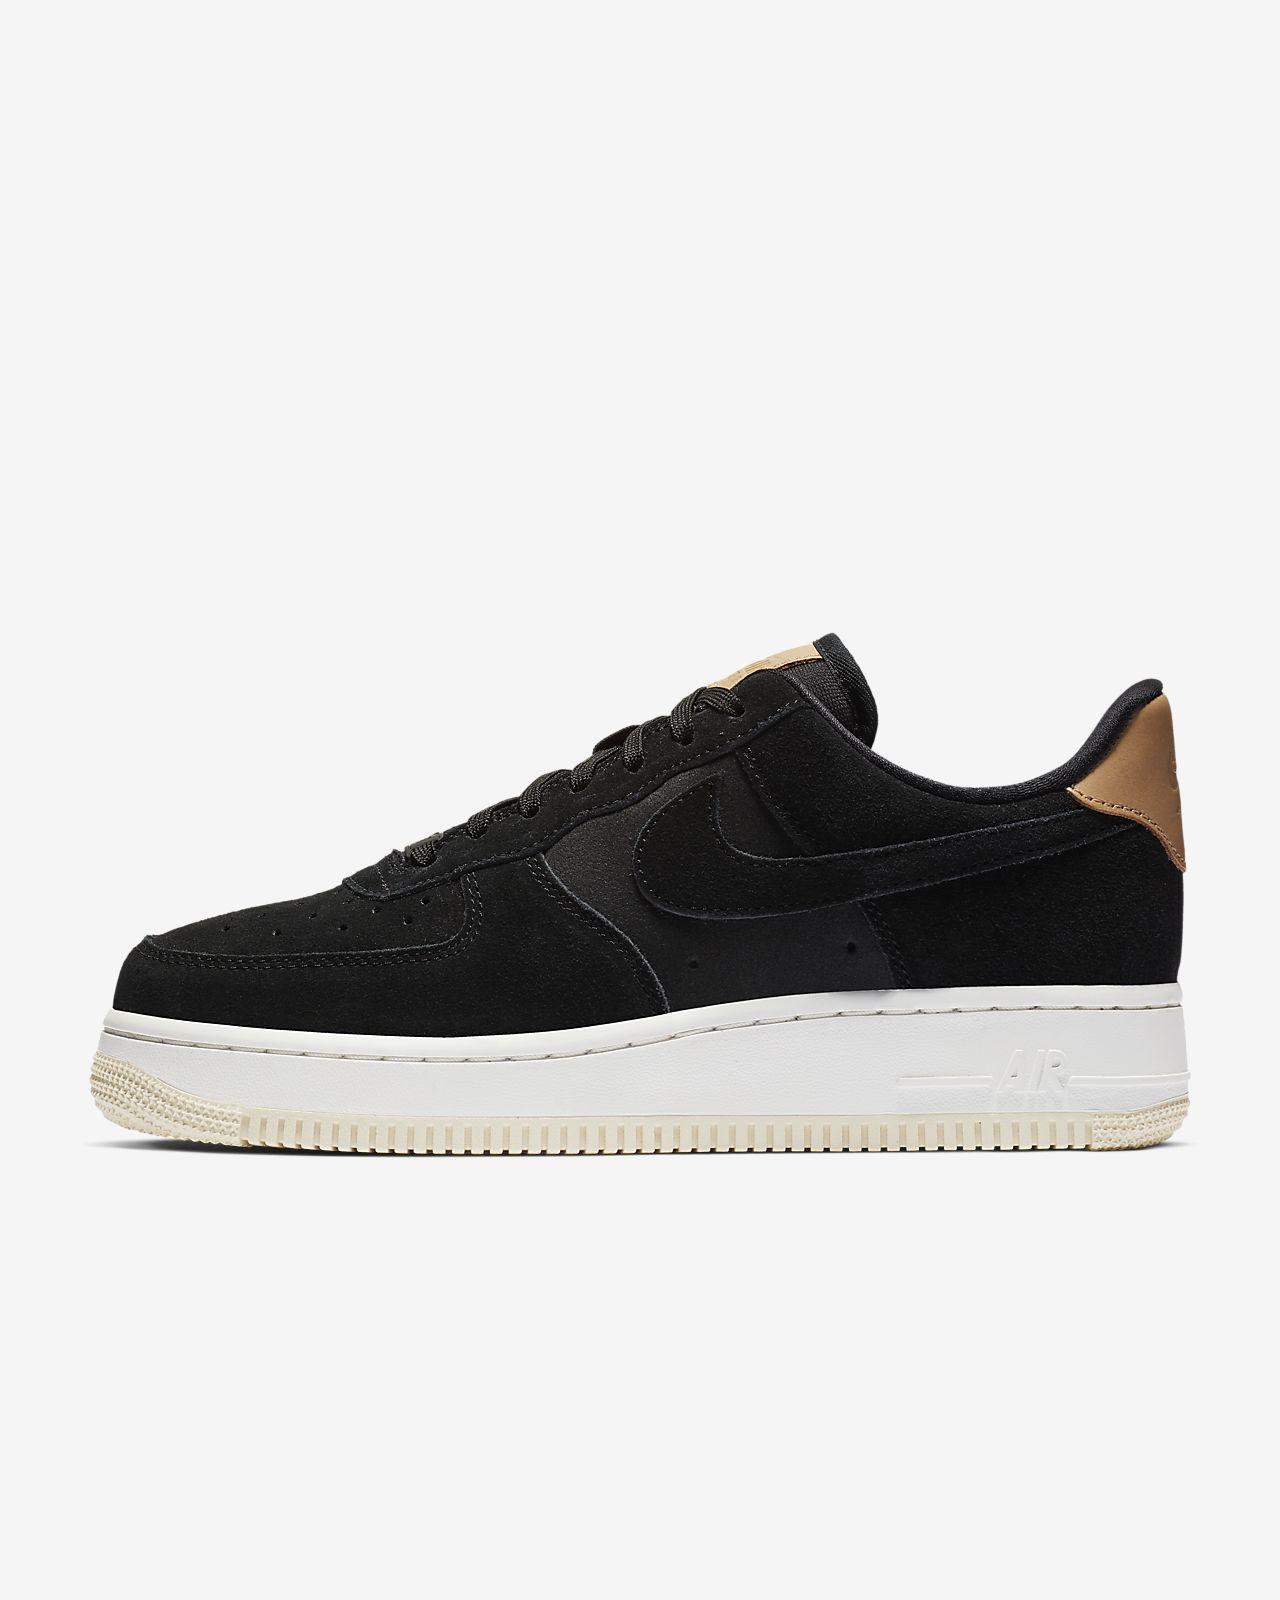 8160640dae0a Nike Air Force 1  07 Low Premium Women s Shoe. Nike.com GB